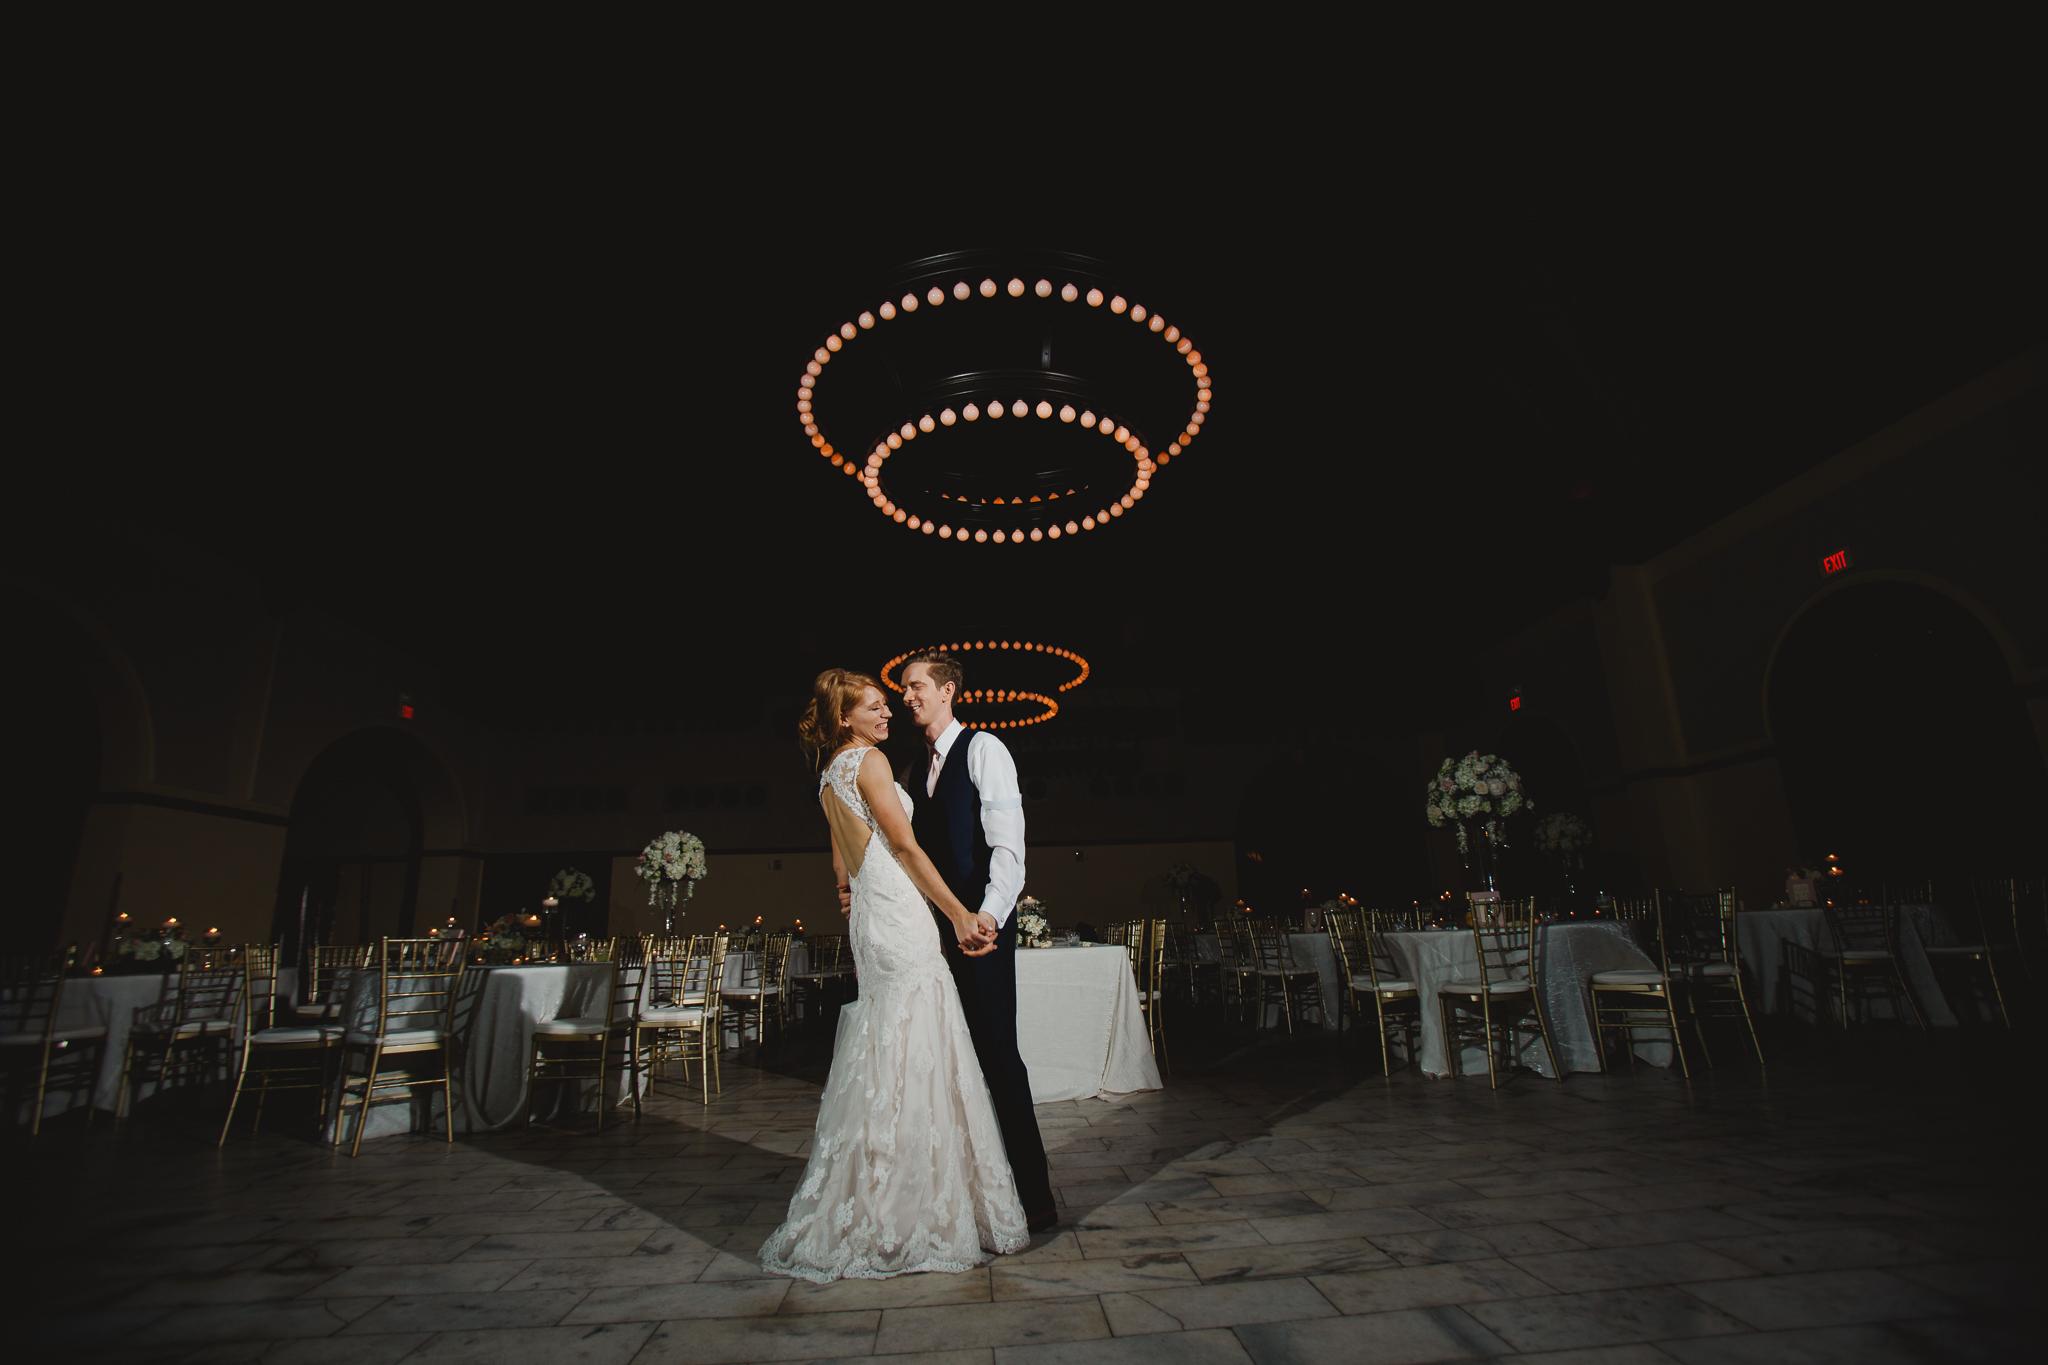 Michael and Kelly - the ashton depot - wedding DFW - wedding photographer- elizalde photography (148 of 150).jpg